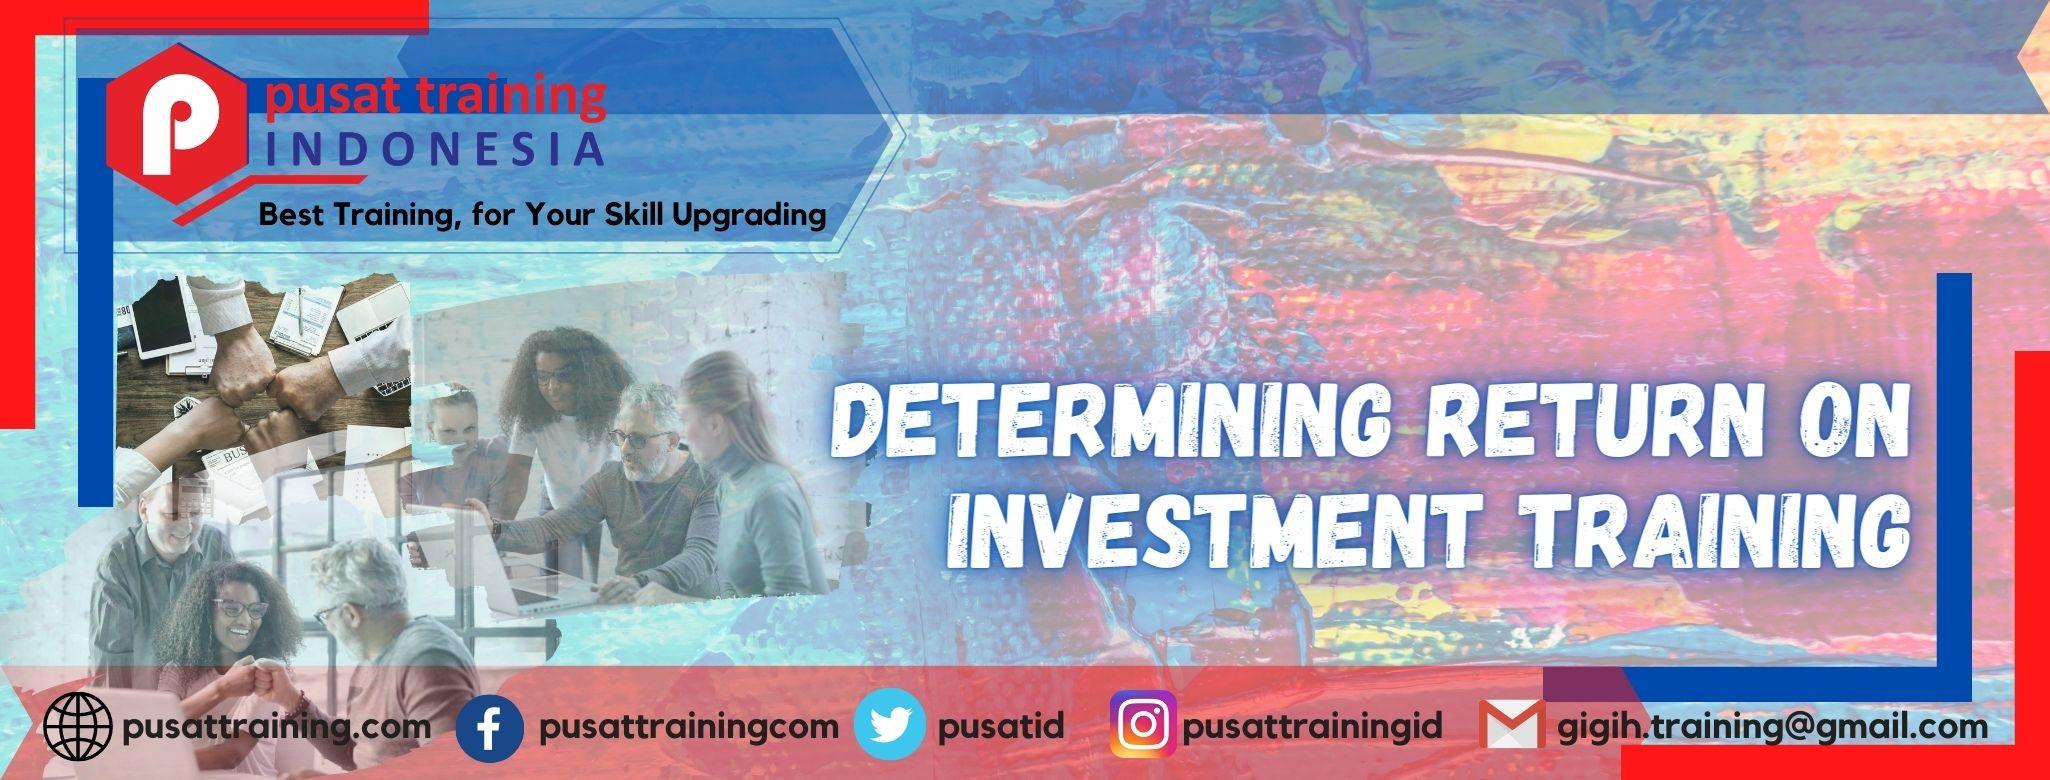 determining-return-on-investment-training